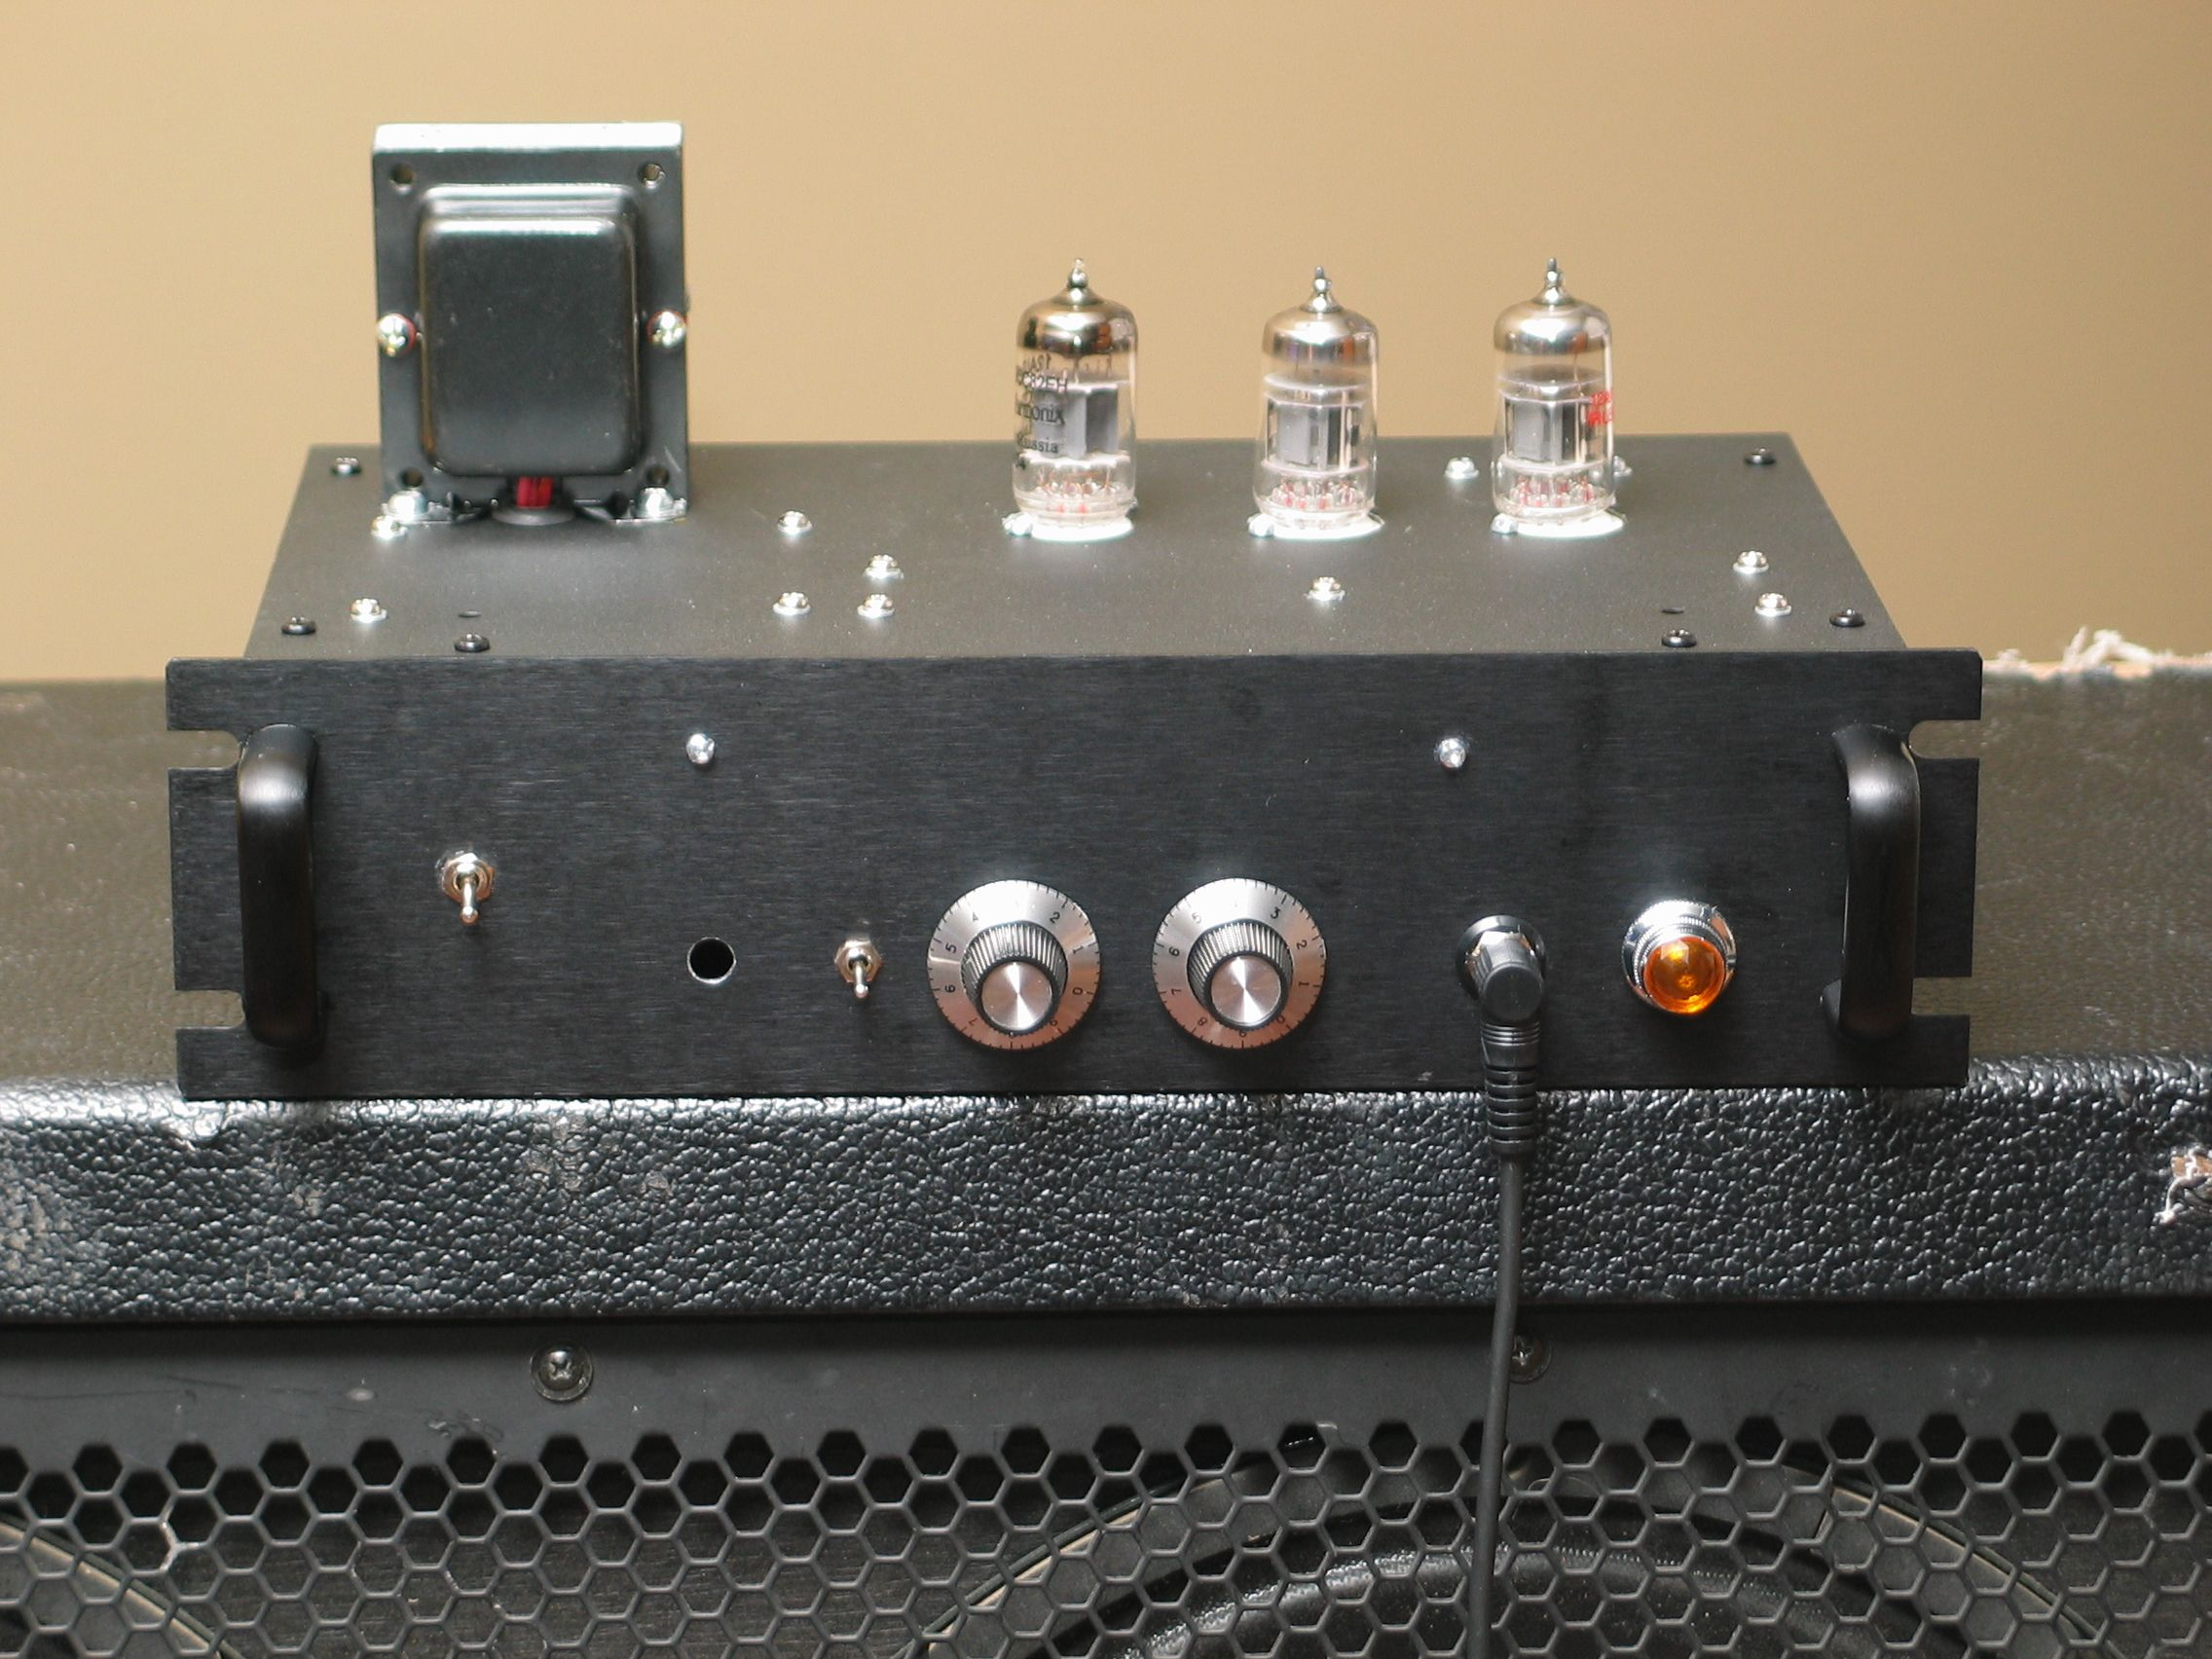 Firefly 1watt 12AU7 tube guitar amp Guitar amp, Diy